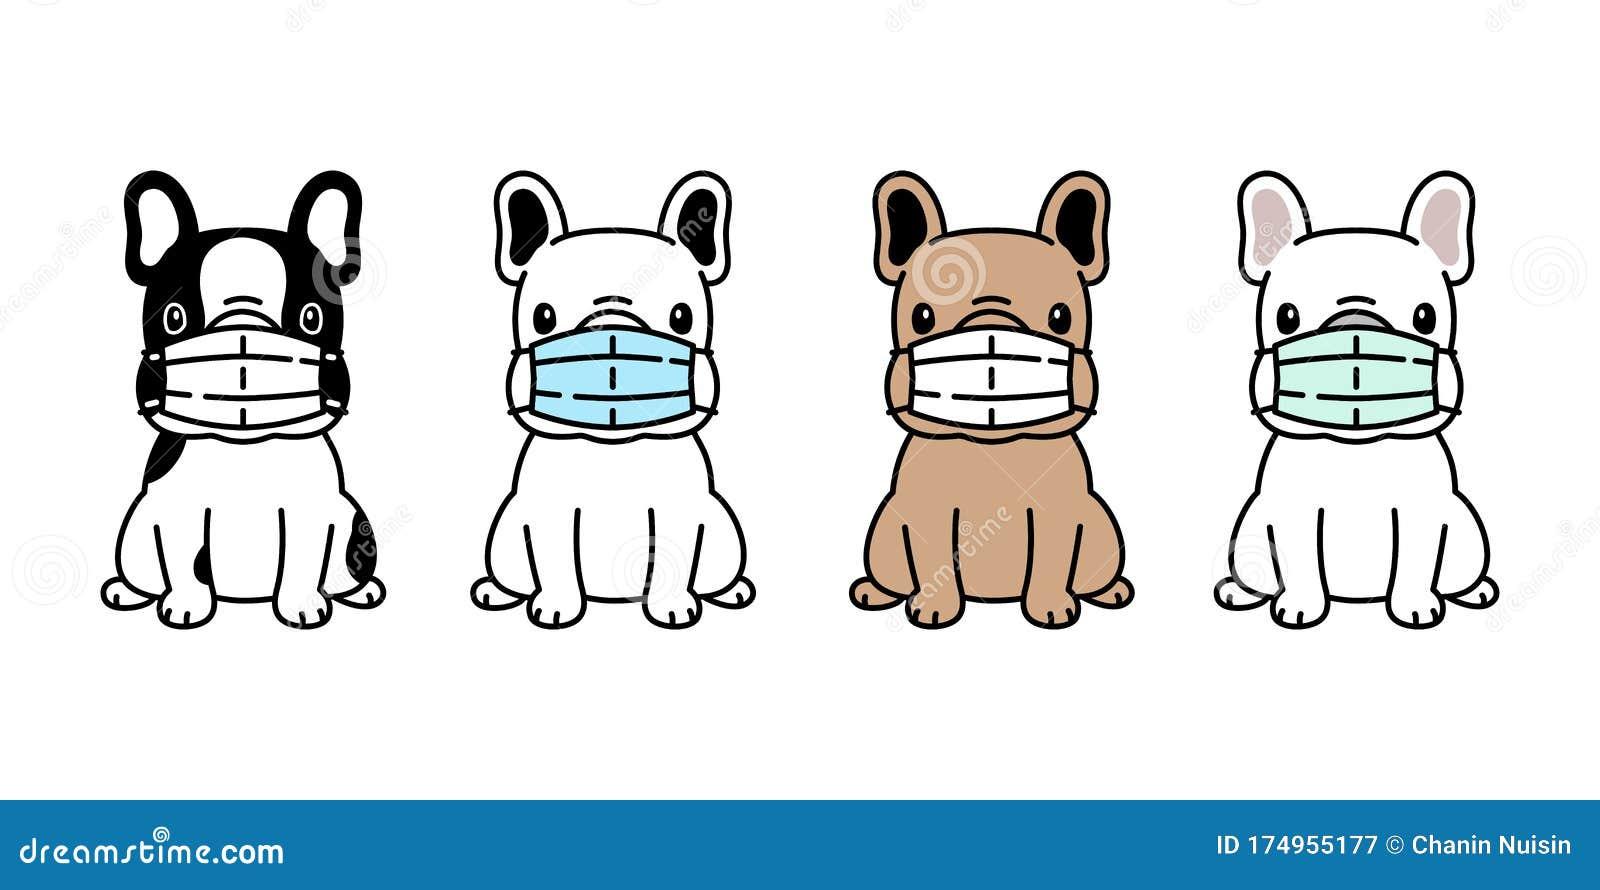 Dog Vector Face Mask Covid19 French Bulldog Coronavirus Virus Pm